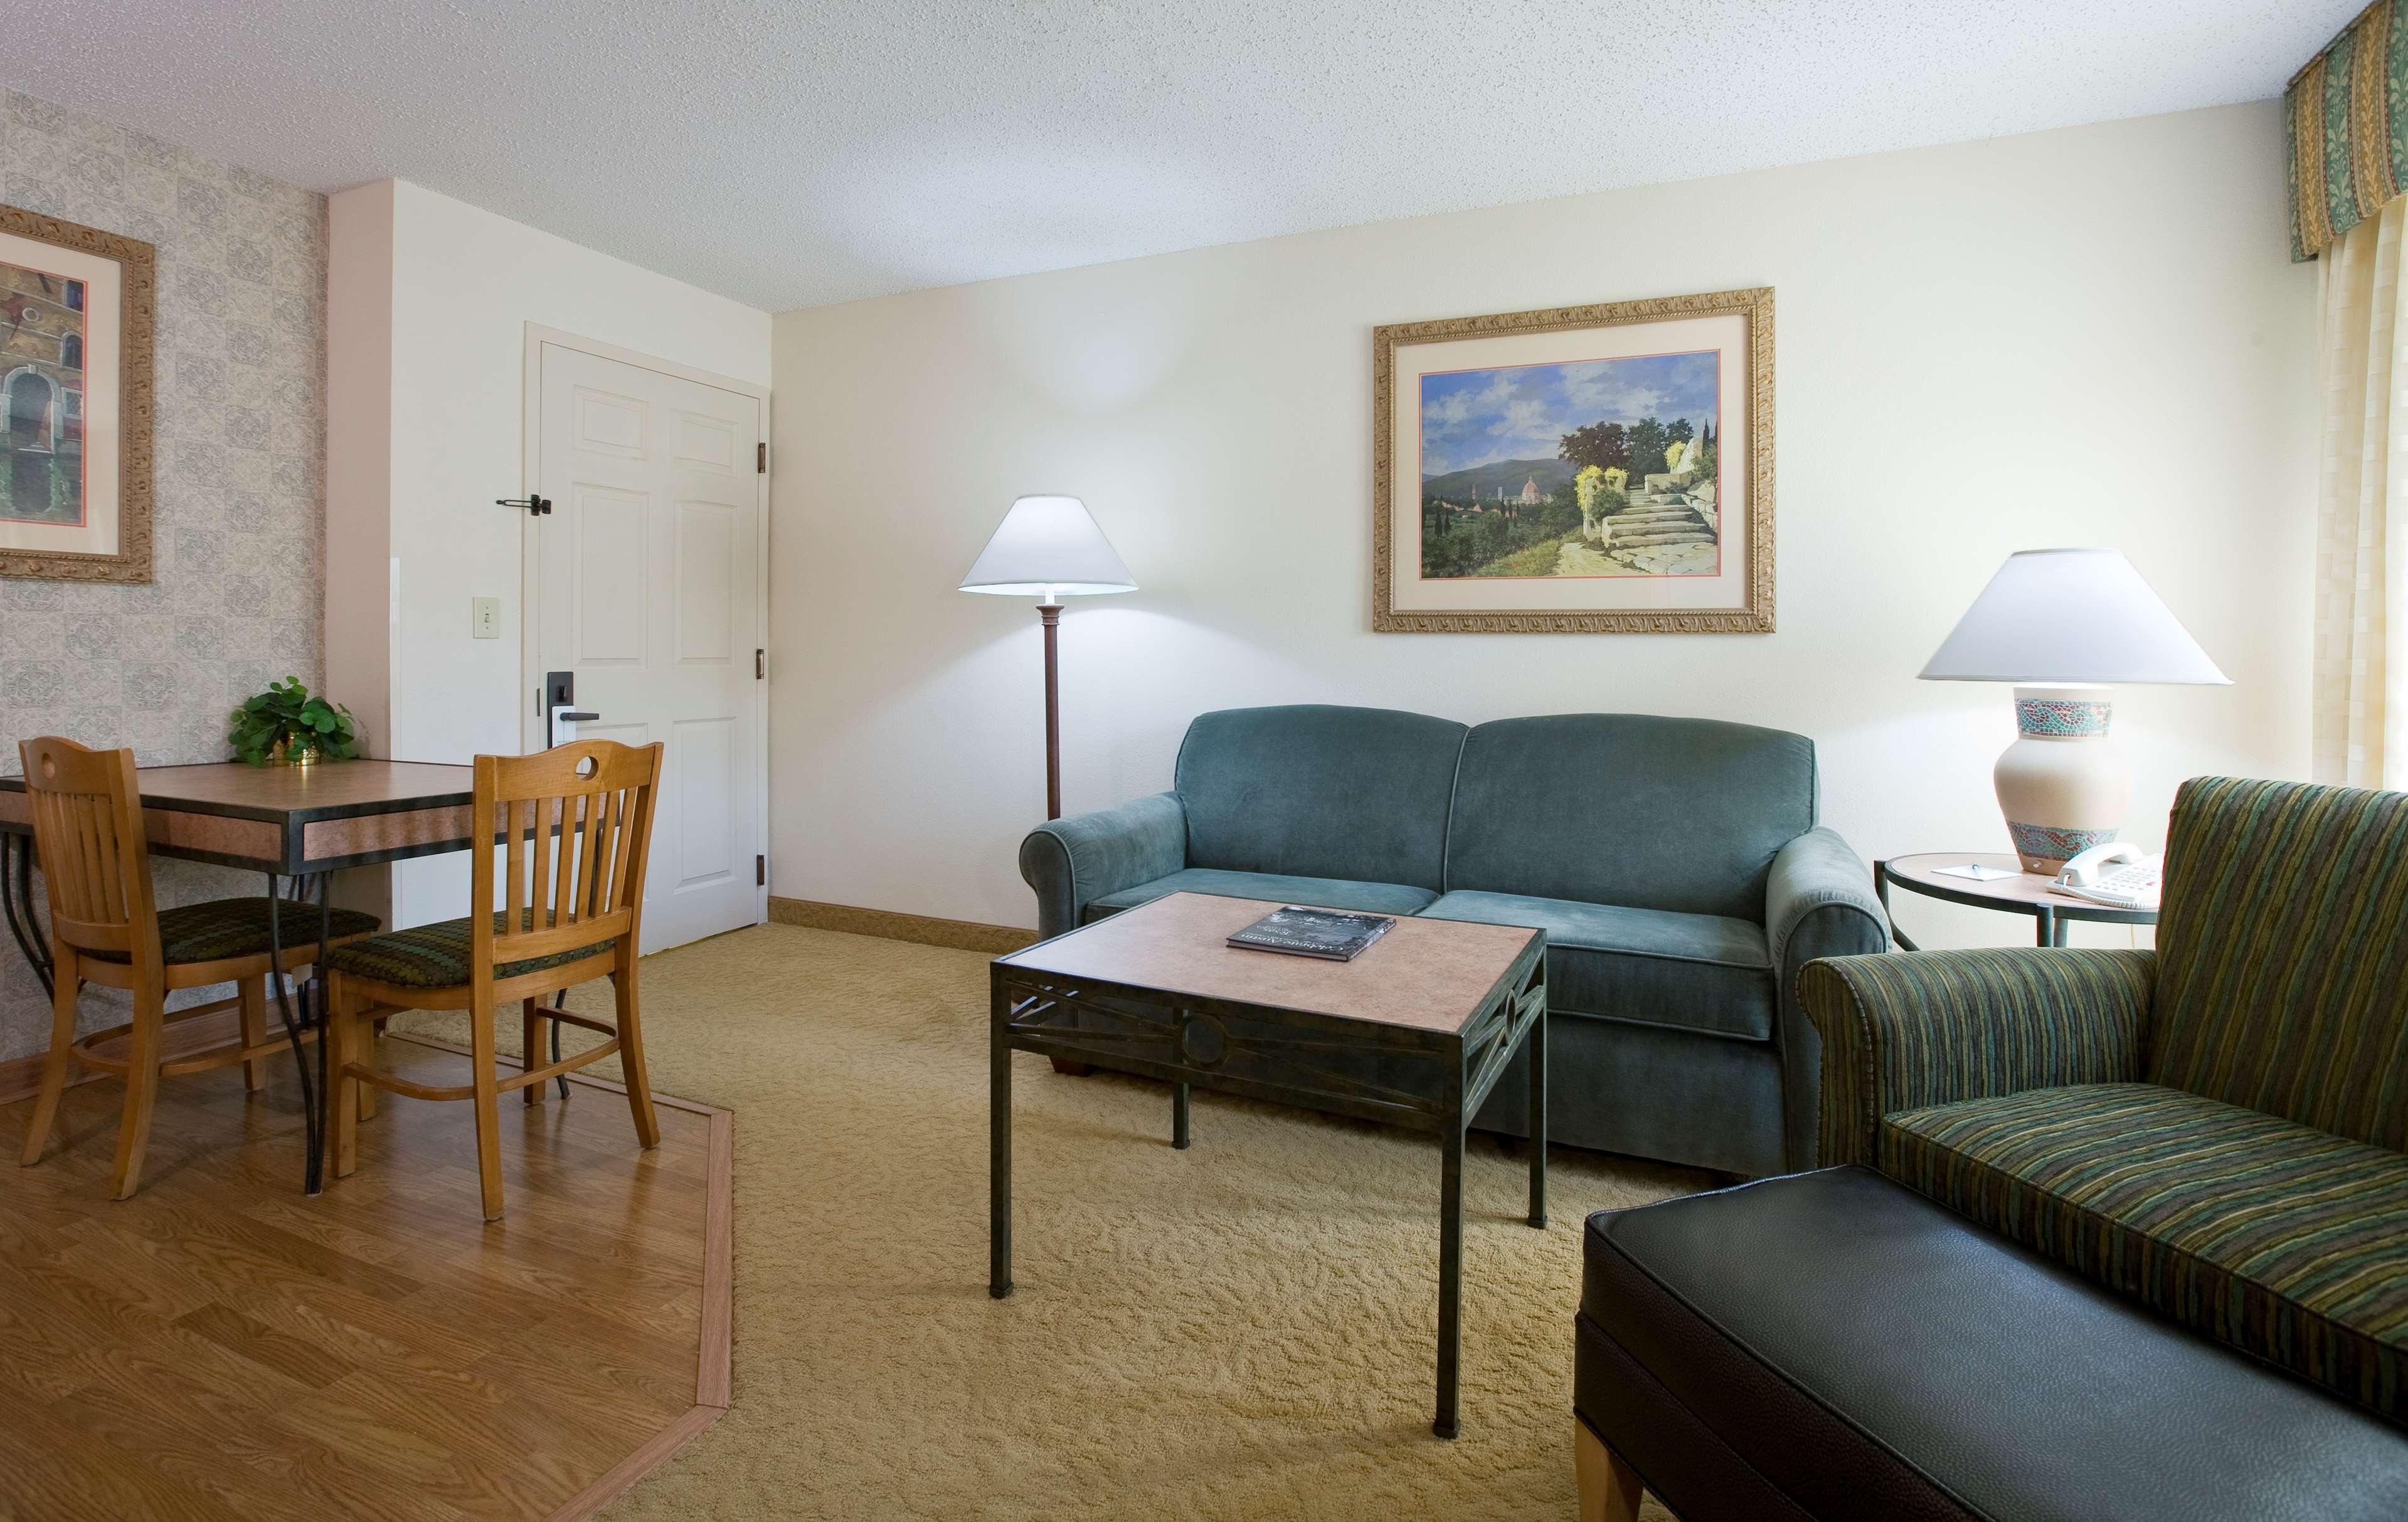 Homewood Suites by Hilton Austin-South/Airport image 7